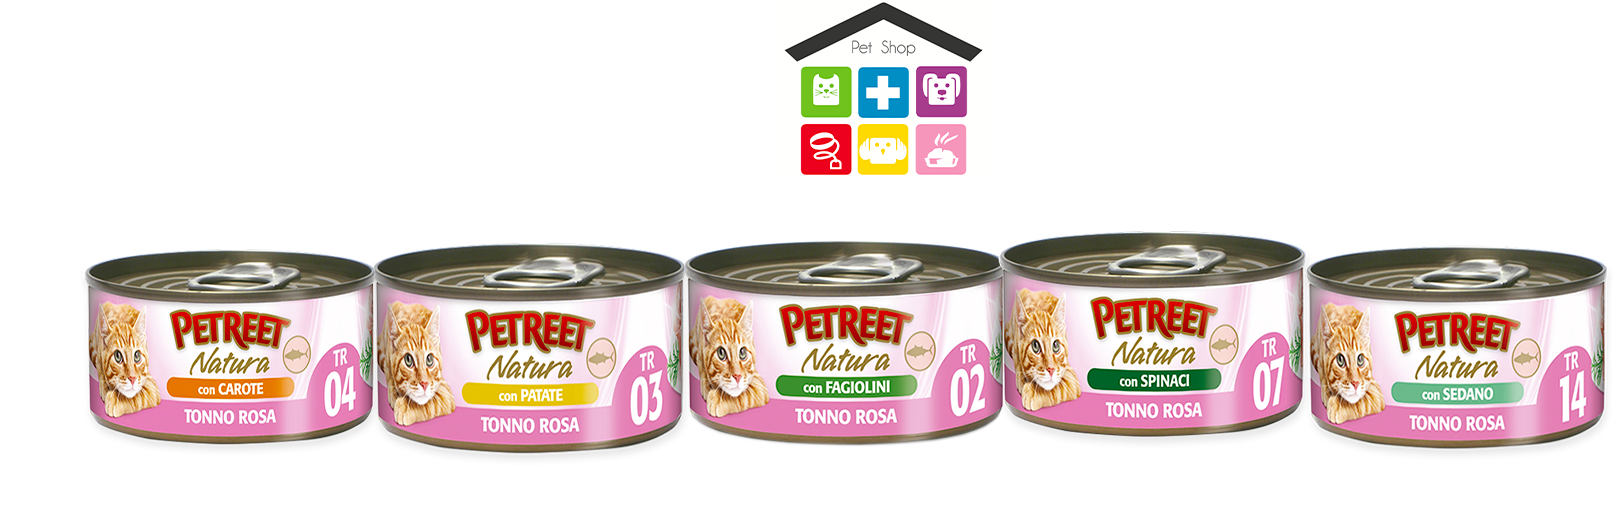 Petreet- natura 0,70 g tonno rosa con fagiolini, patate,spinaci,carote,sedano